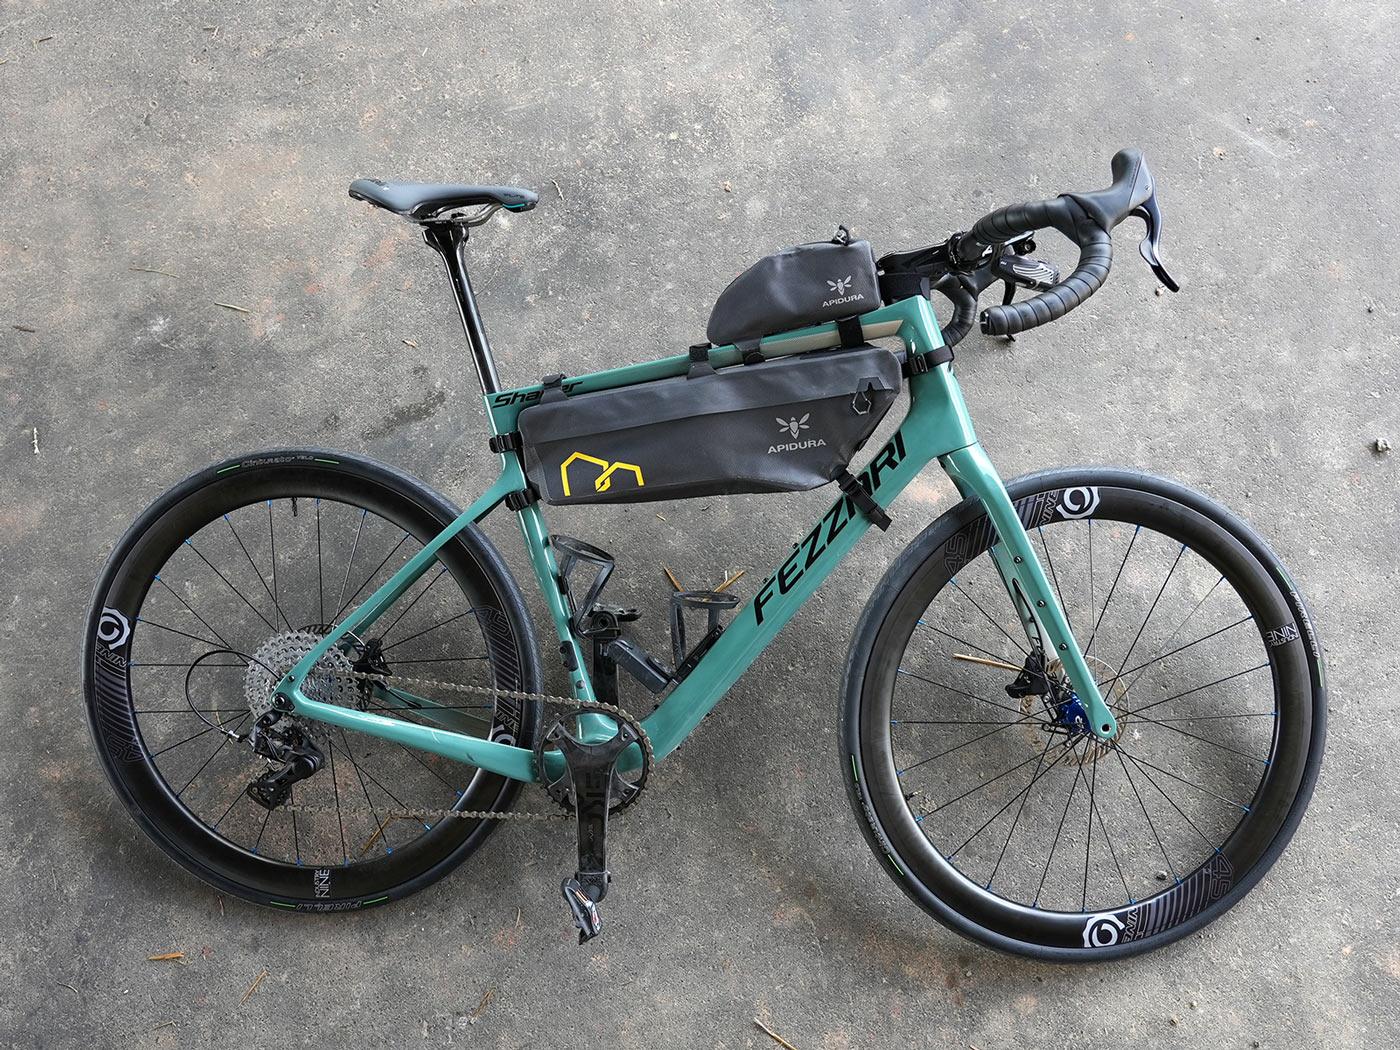 fezzari shafer gravel bike with road wheels and frame bags